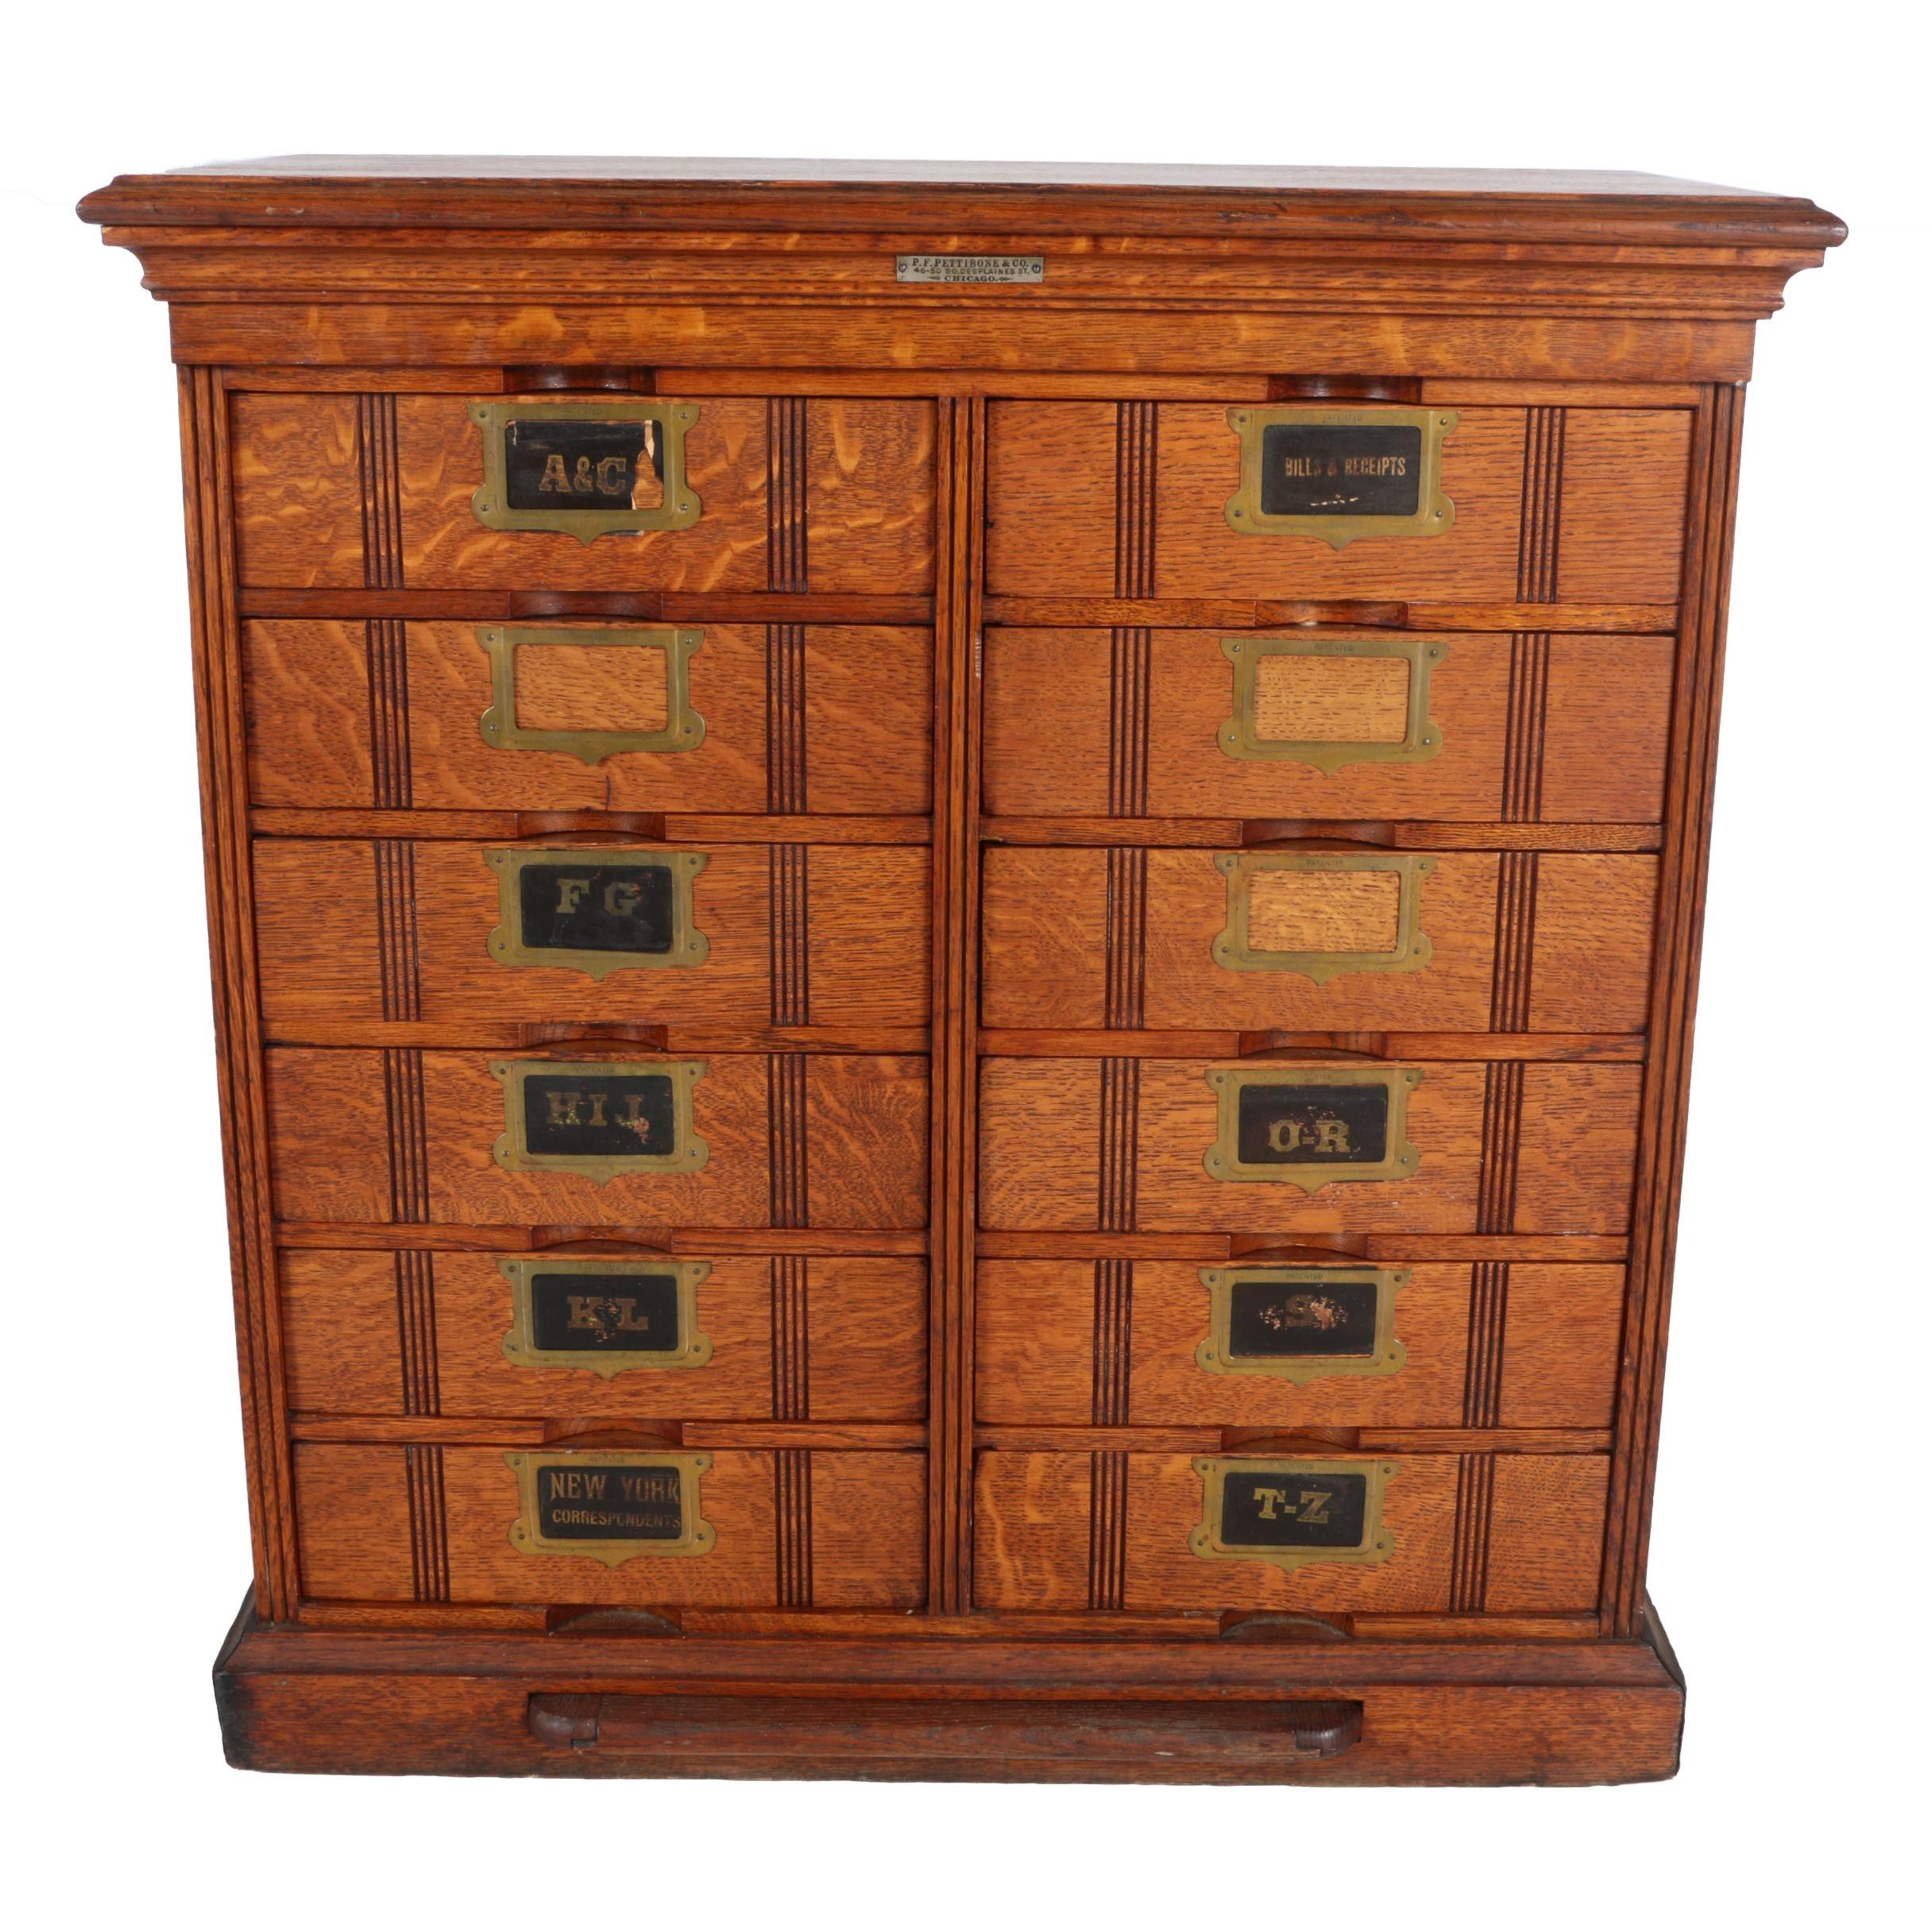 Antique Oak Document Sorter Chest by P. F. Pettibone & Co.